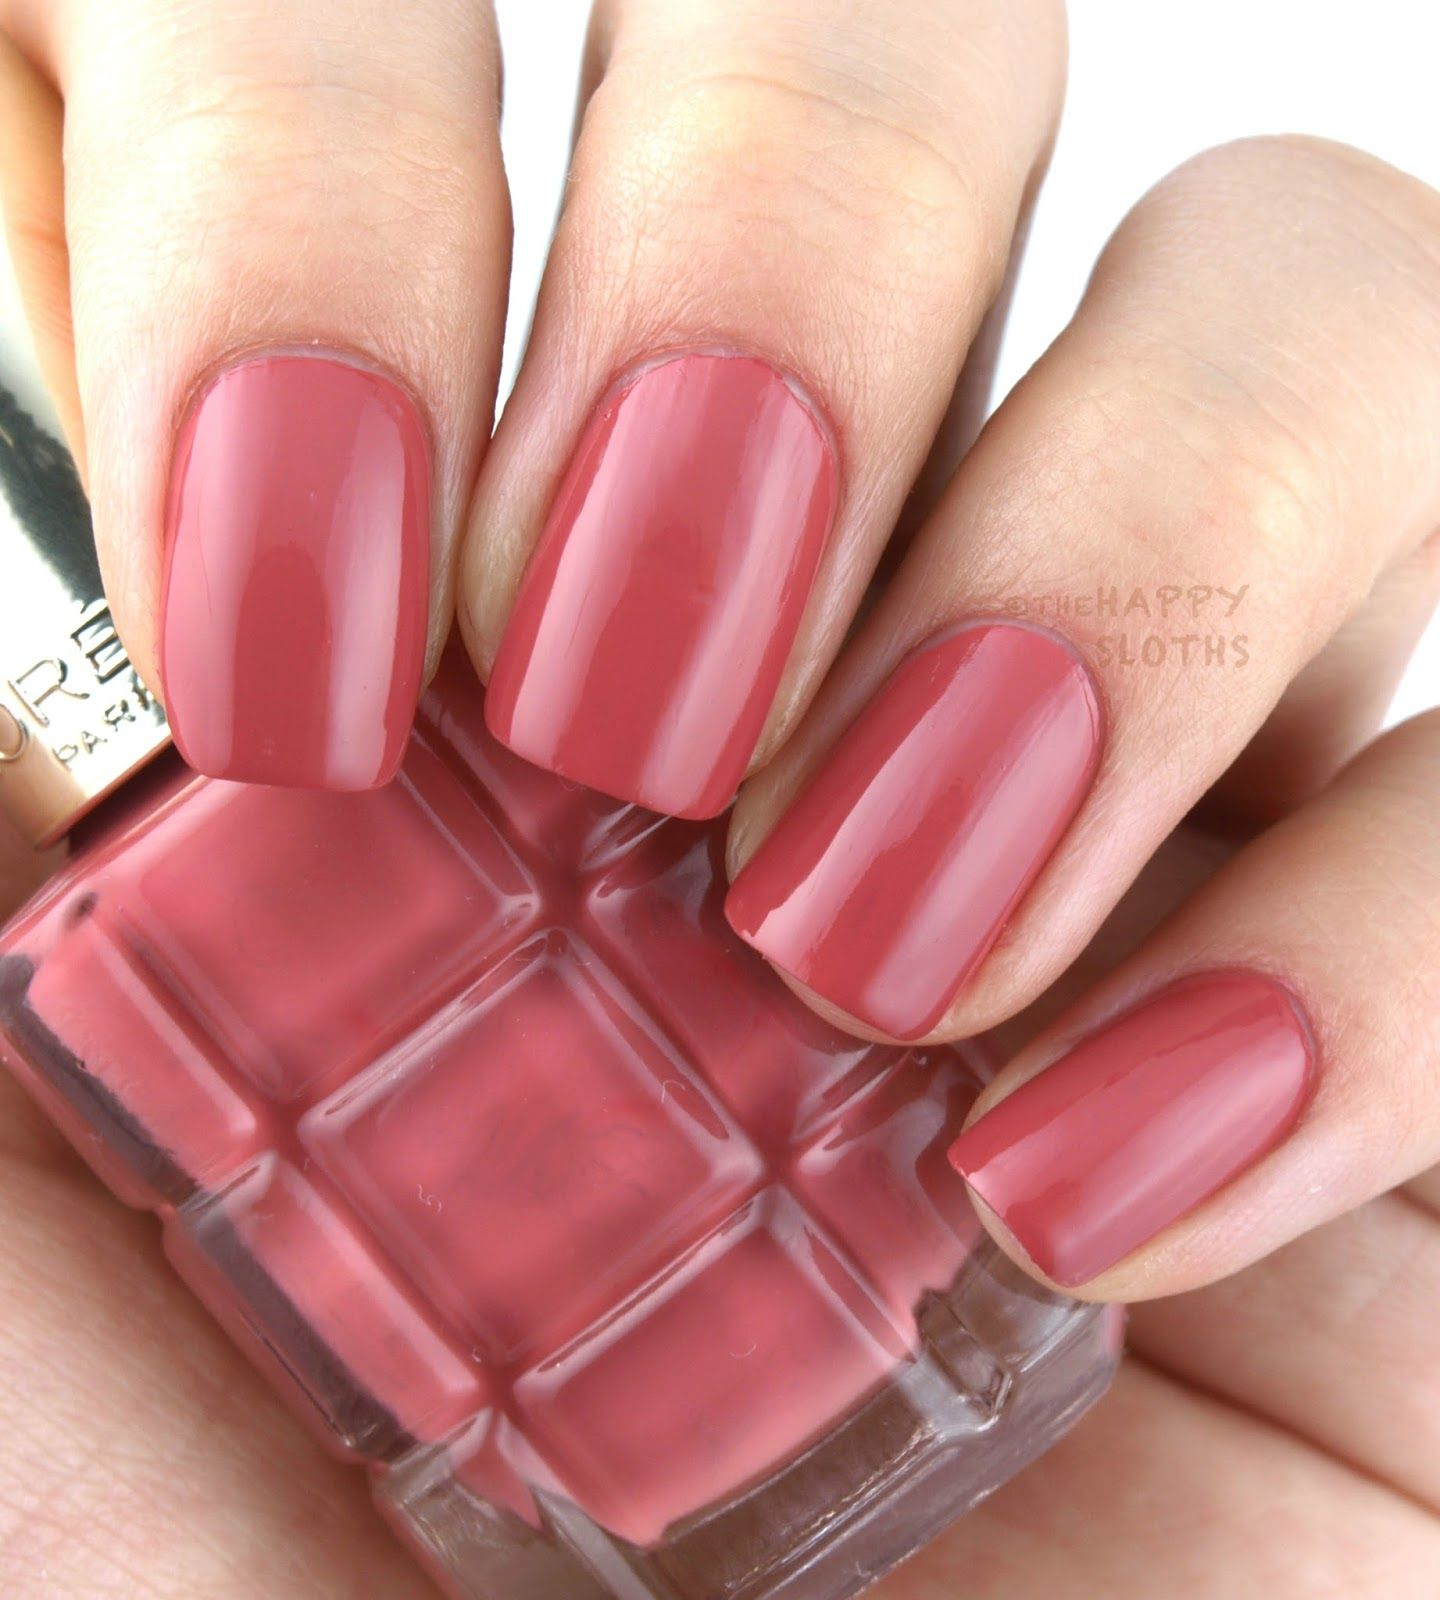 L Oreal Color Riche Le Vernis A L Huile Nail Polish Review And Swatches Nail Polish Nail Polish Colors Loreal Nail Polish